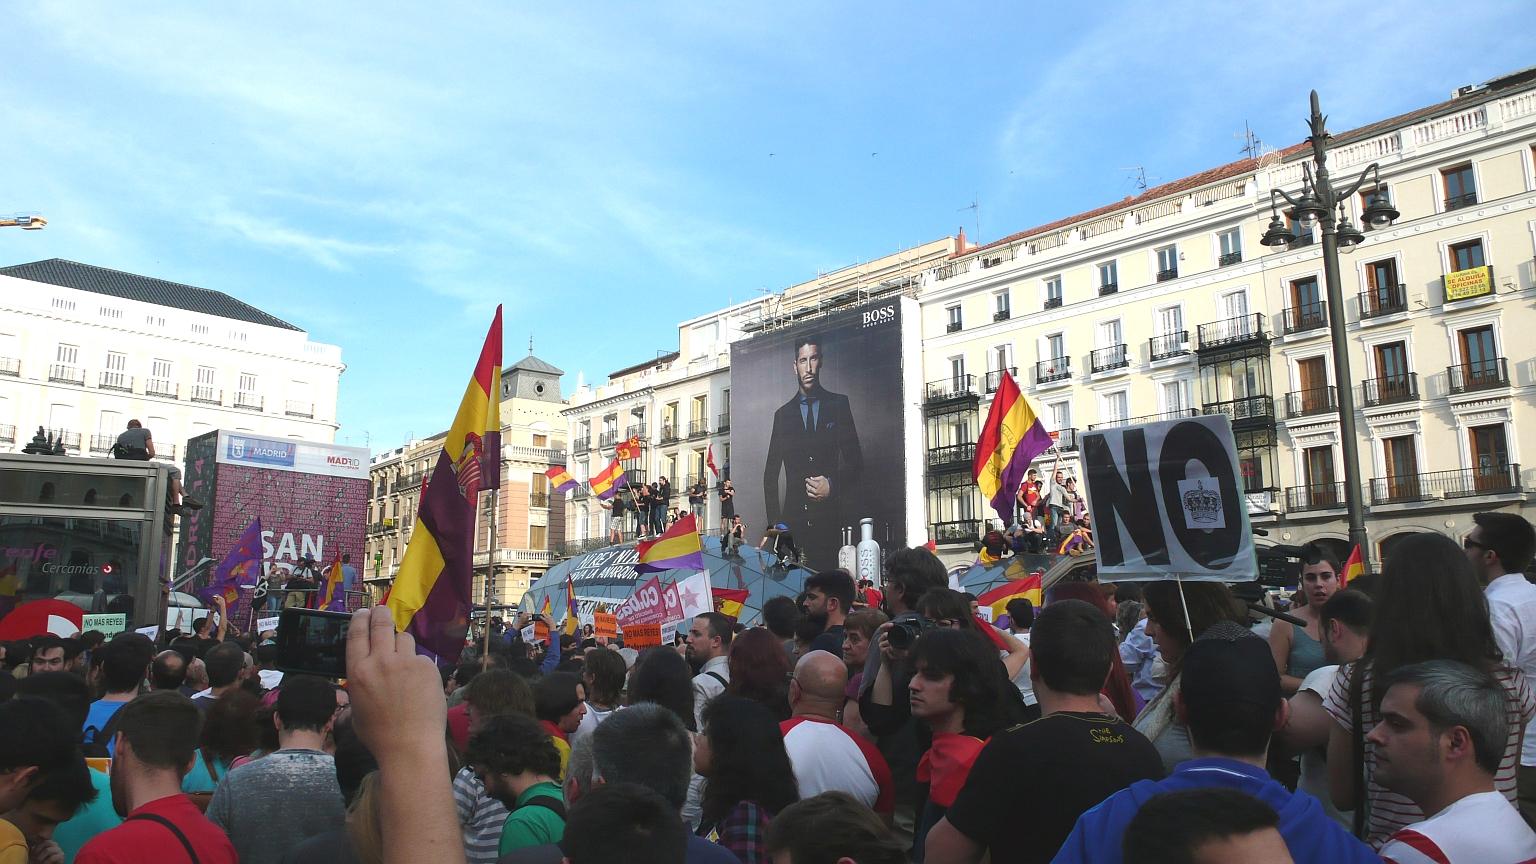 Puerta_del_Sol_Multitude_2014_06_02_1_B